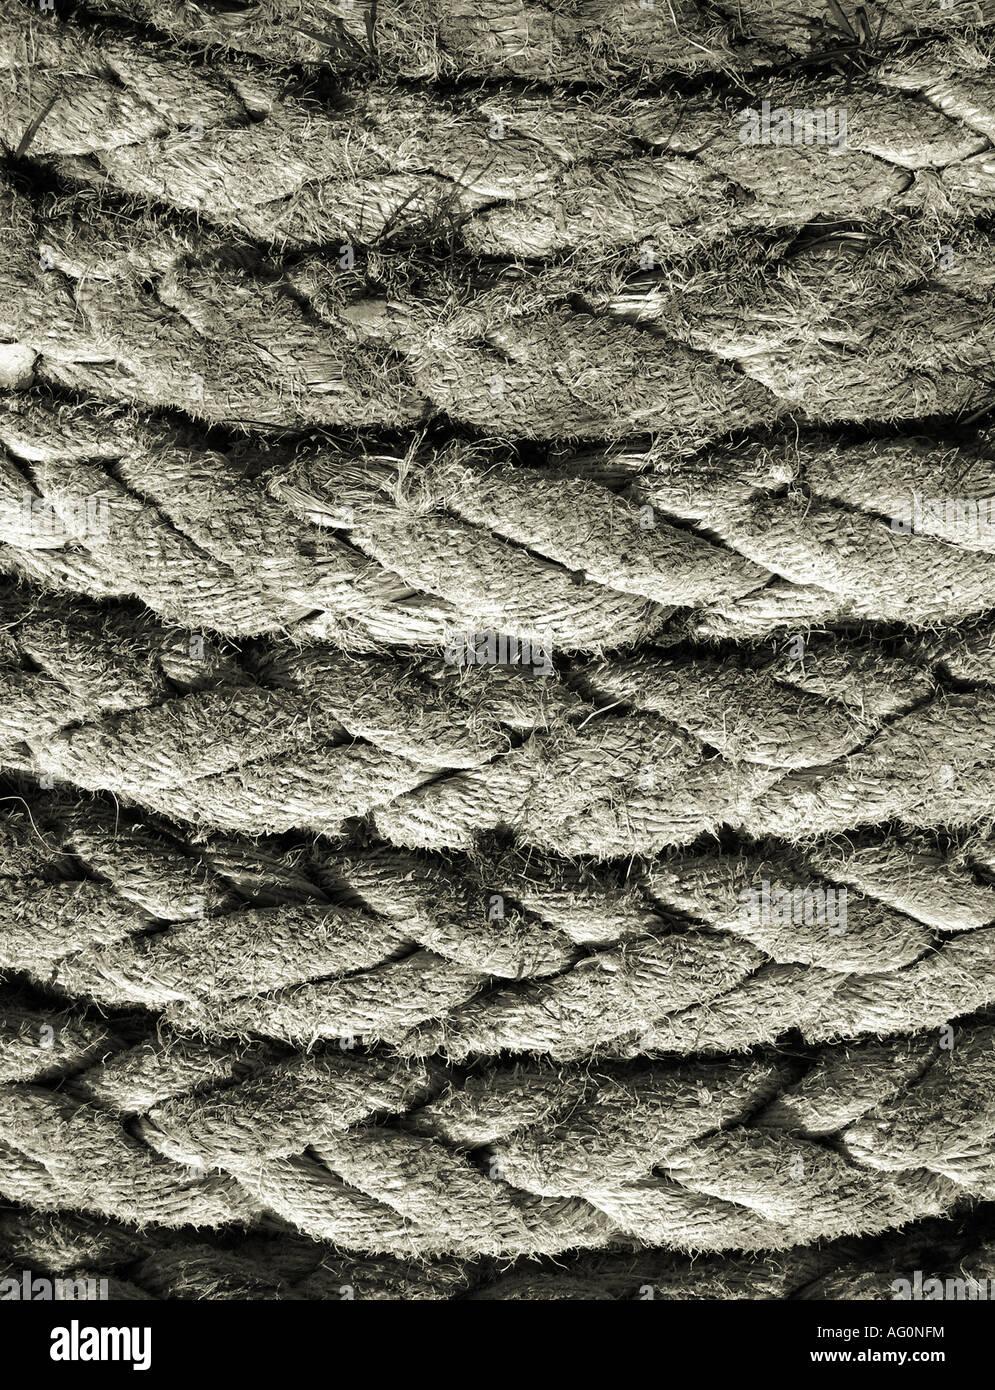 Purga completa de disparos cerca de espeso manto hecha de fibras naturales Imagen De Stock